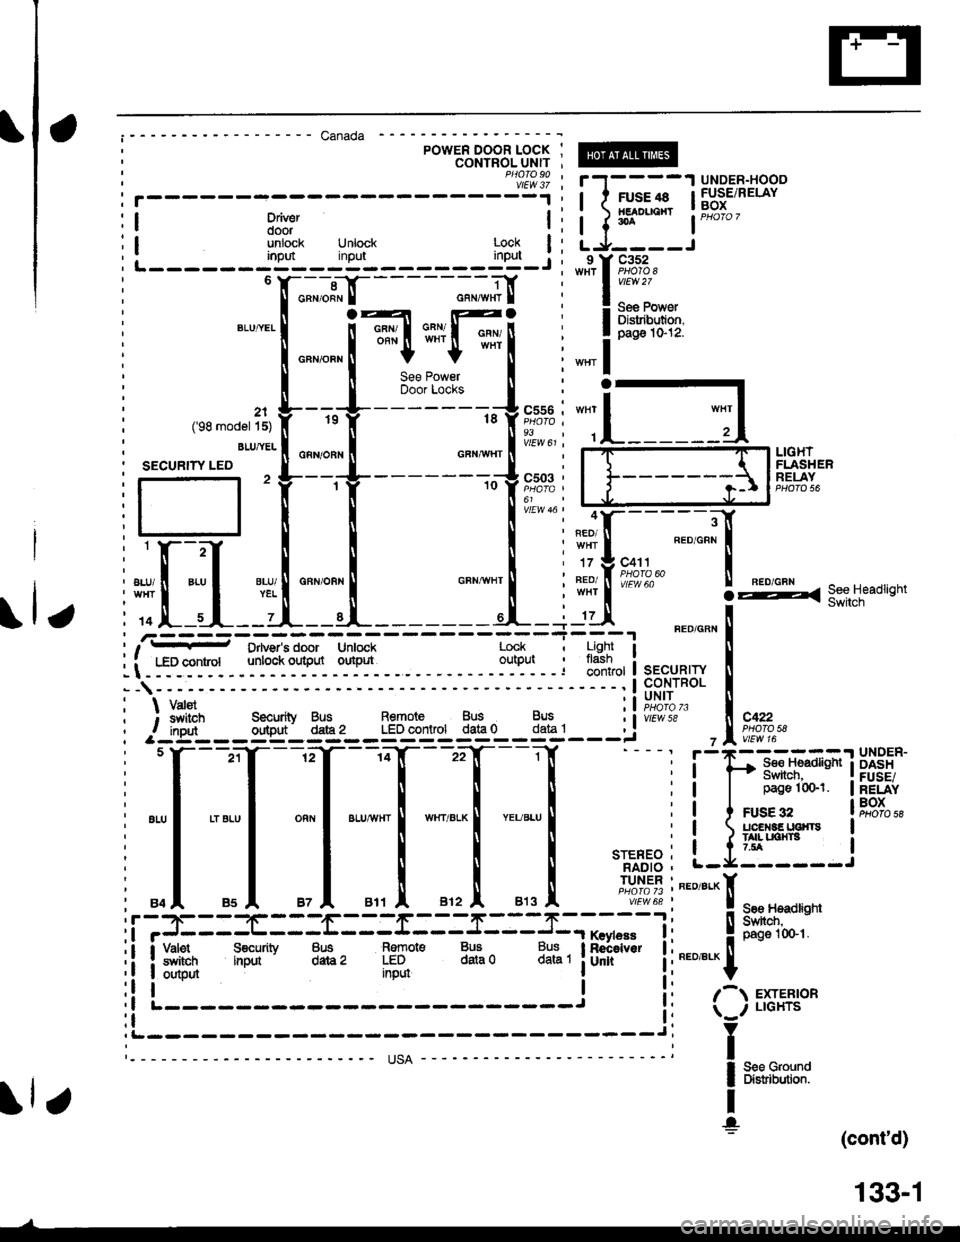 Turn Signal Wiring Diagram Gmc Terrain Wire Data Schema Fuse Box C6500 2010 Diagrams 2008